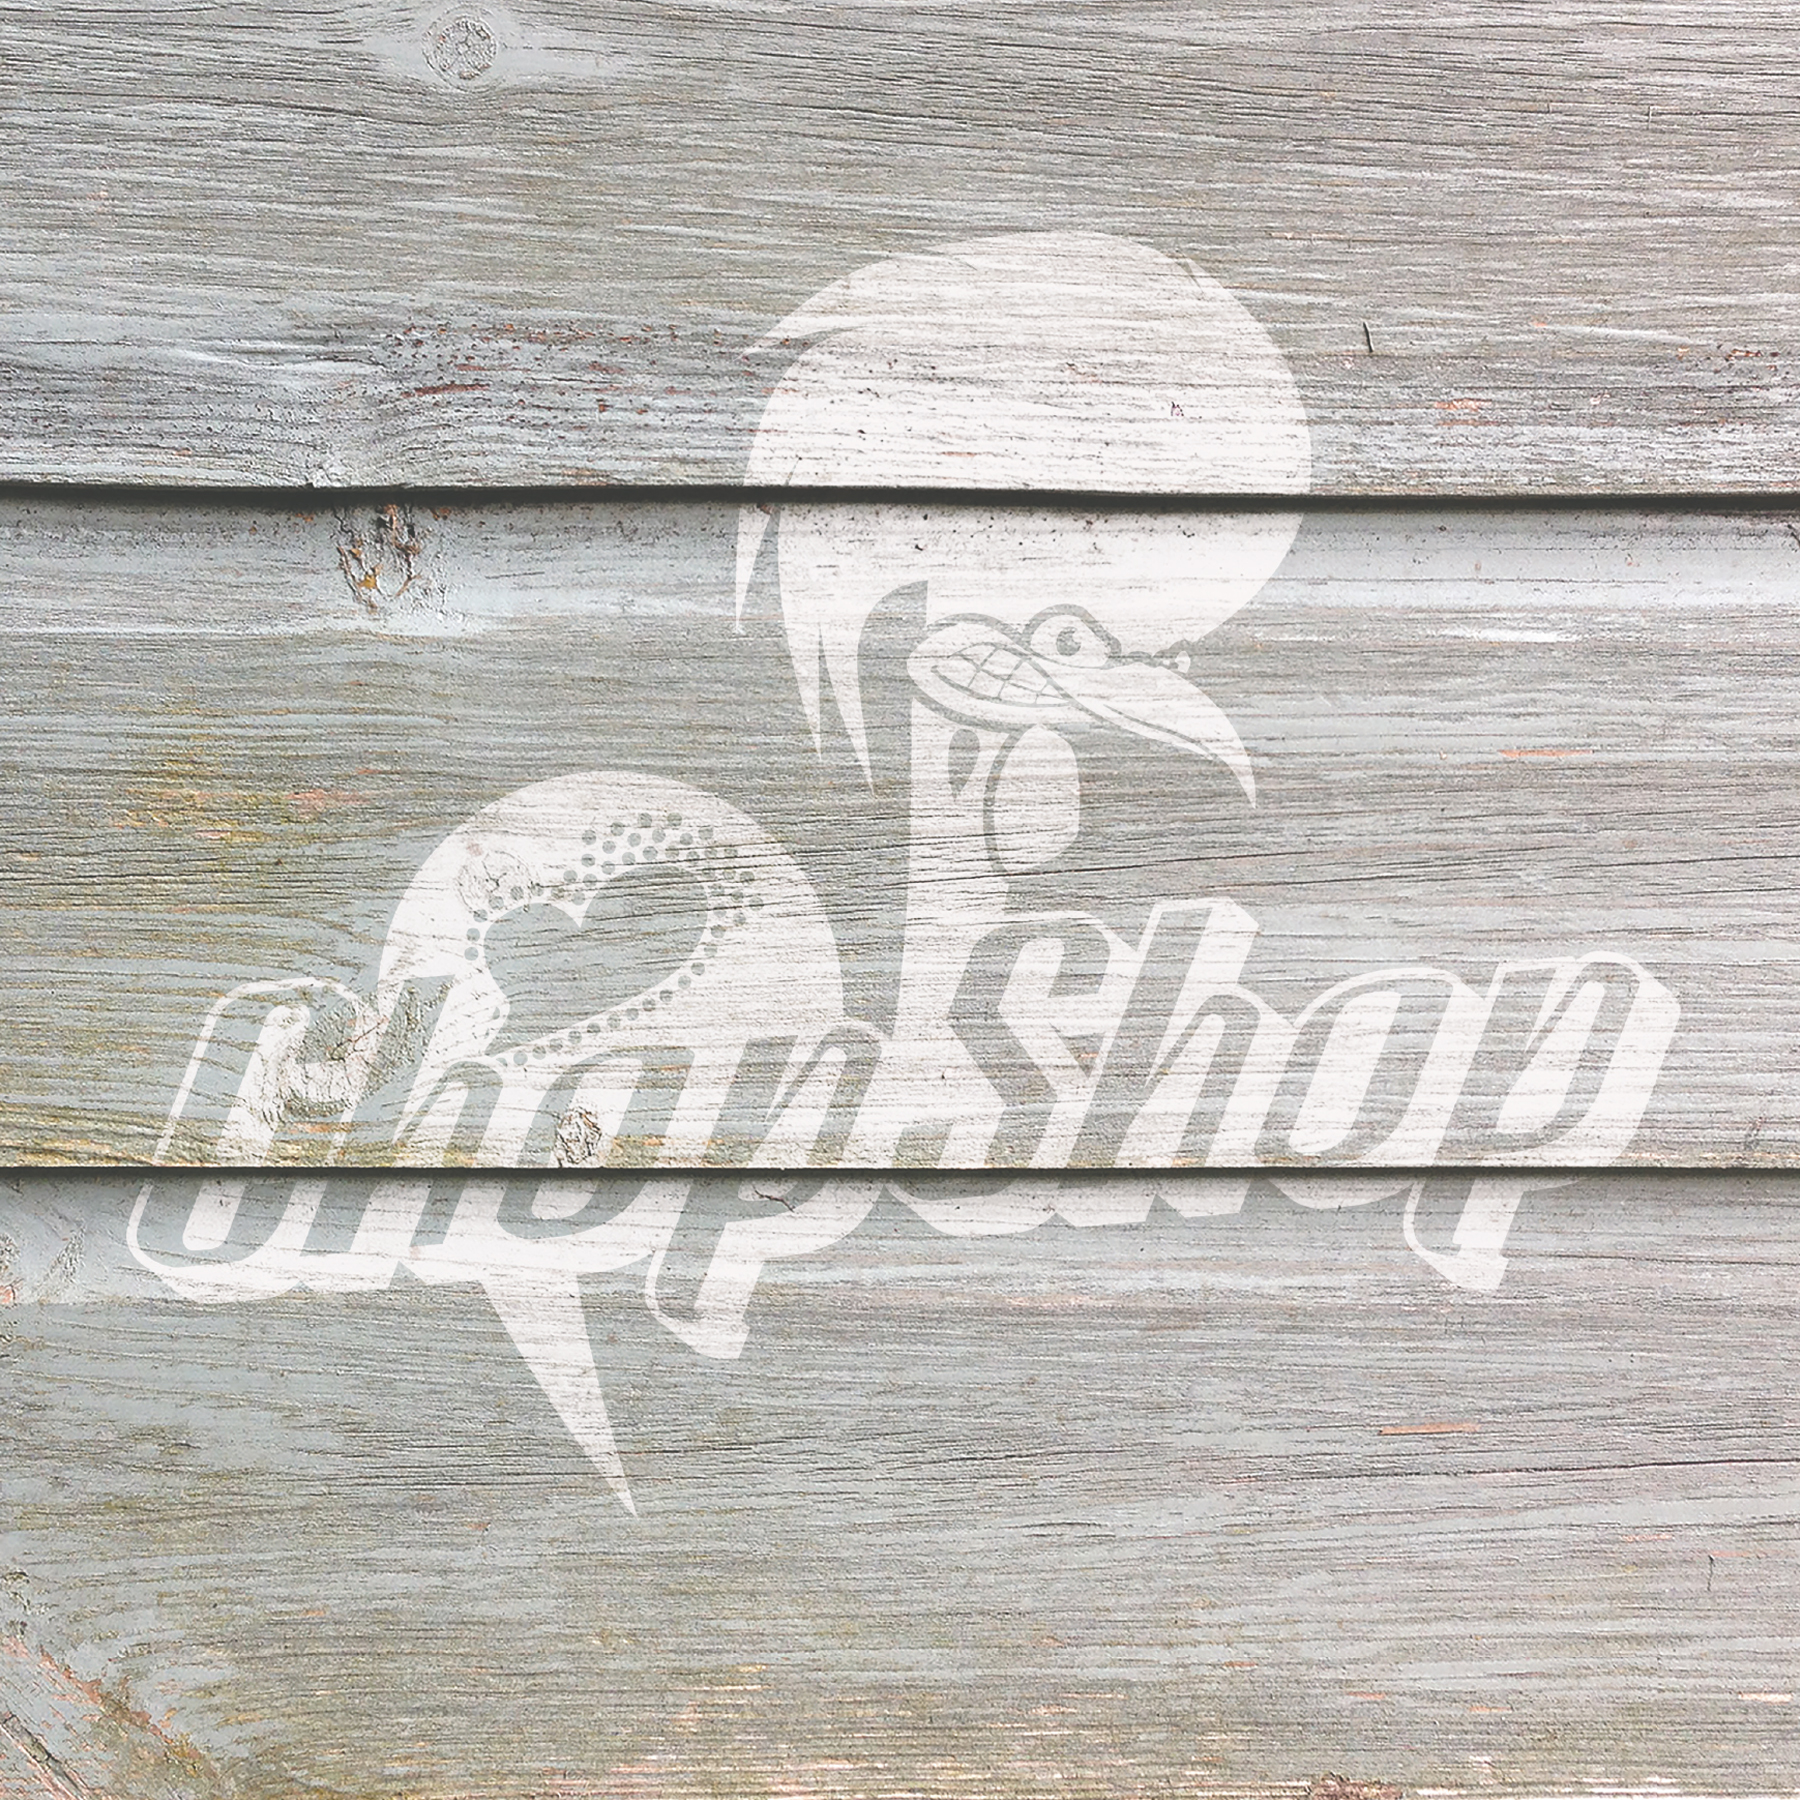 chopshop1